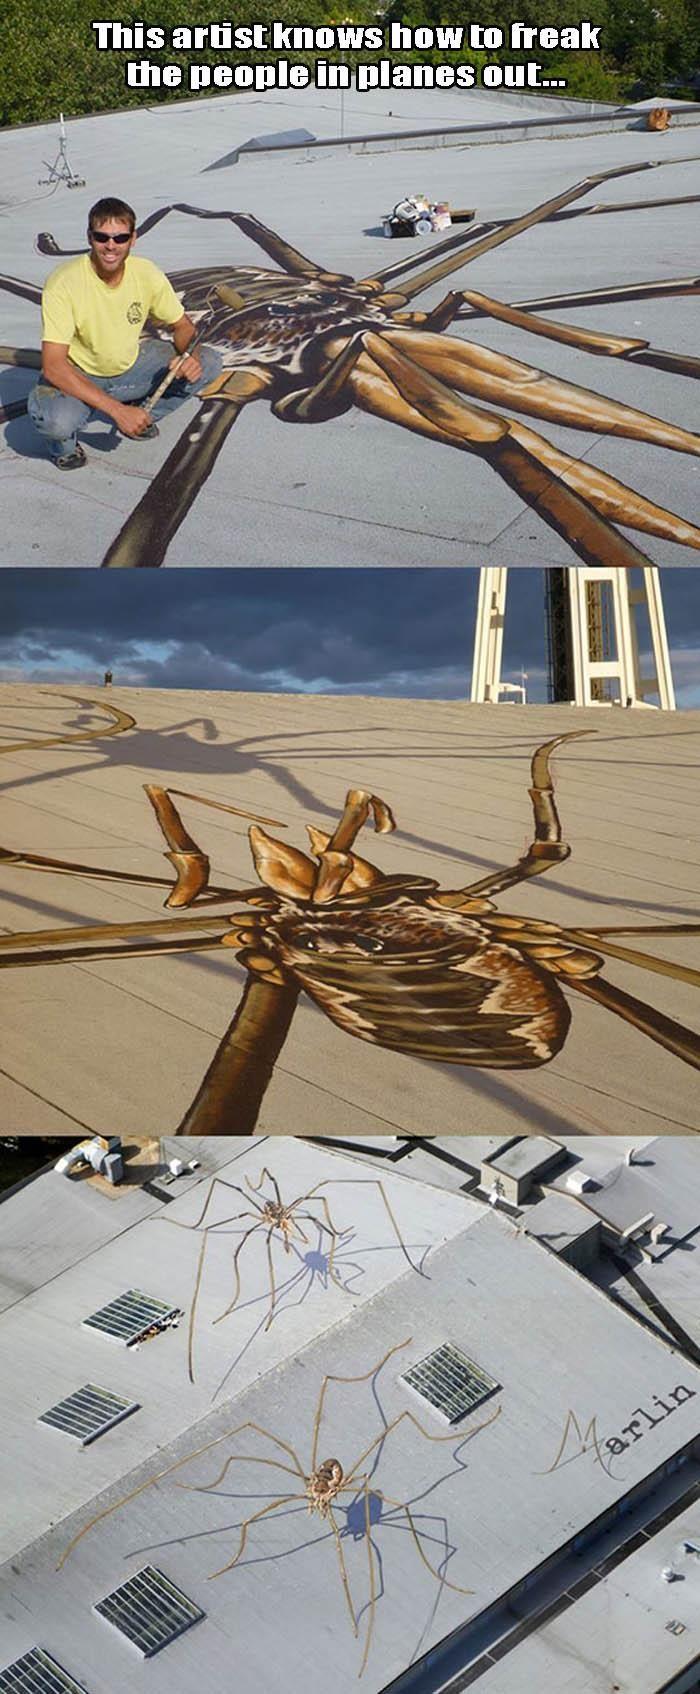 Artist Trolls Planes Like A Boss! – 3 Pics